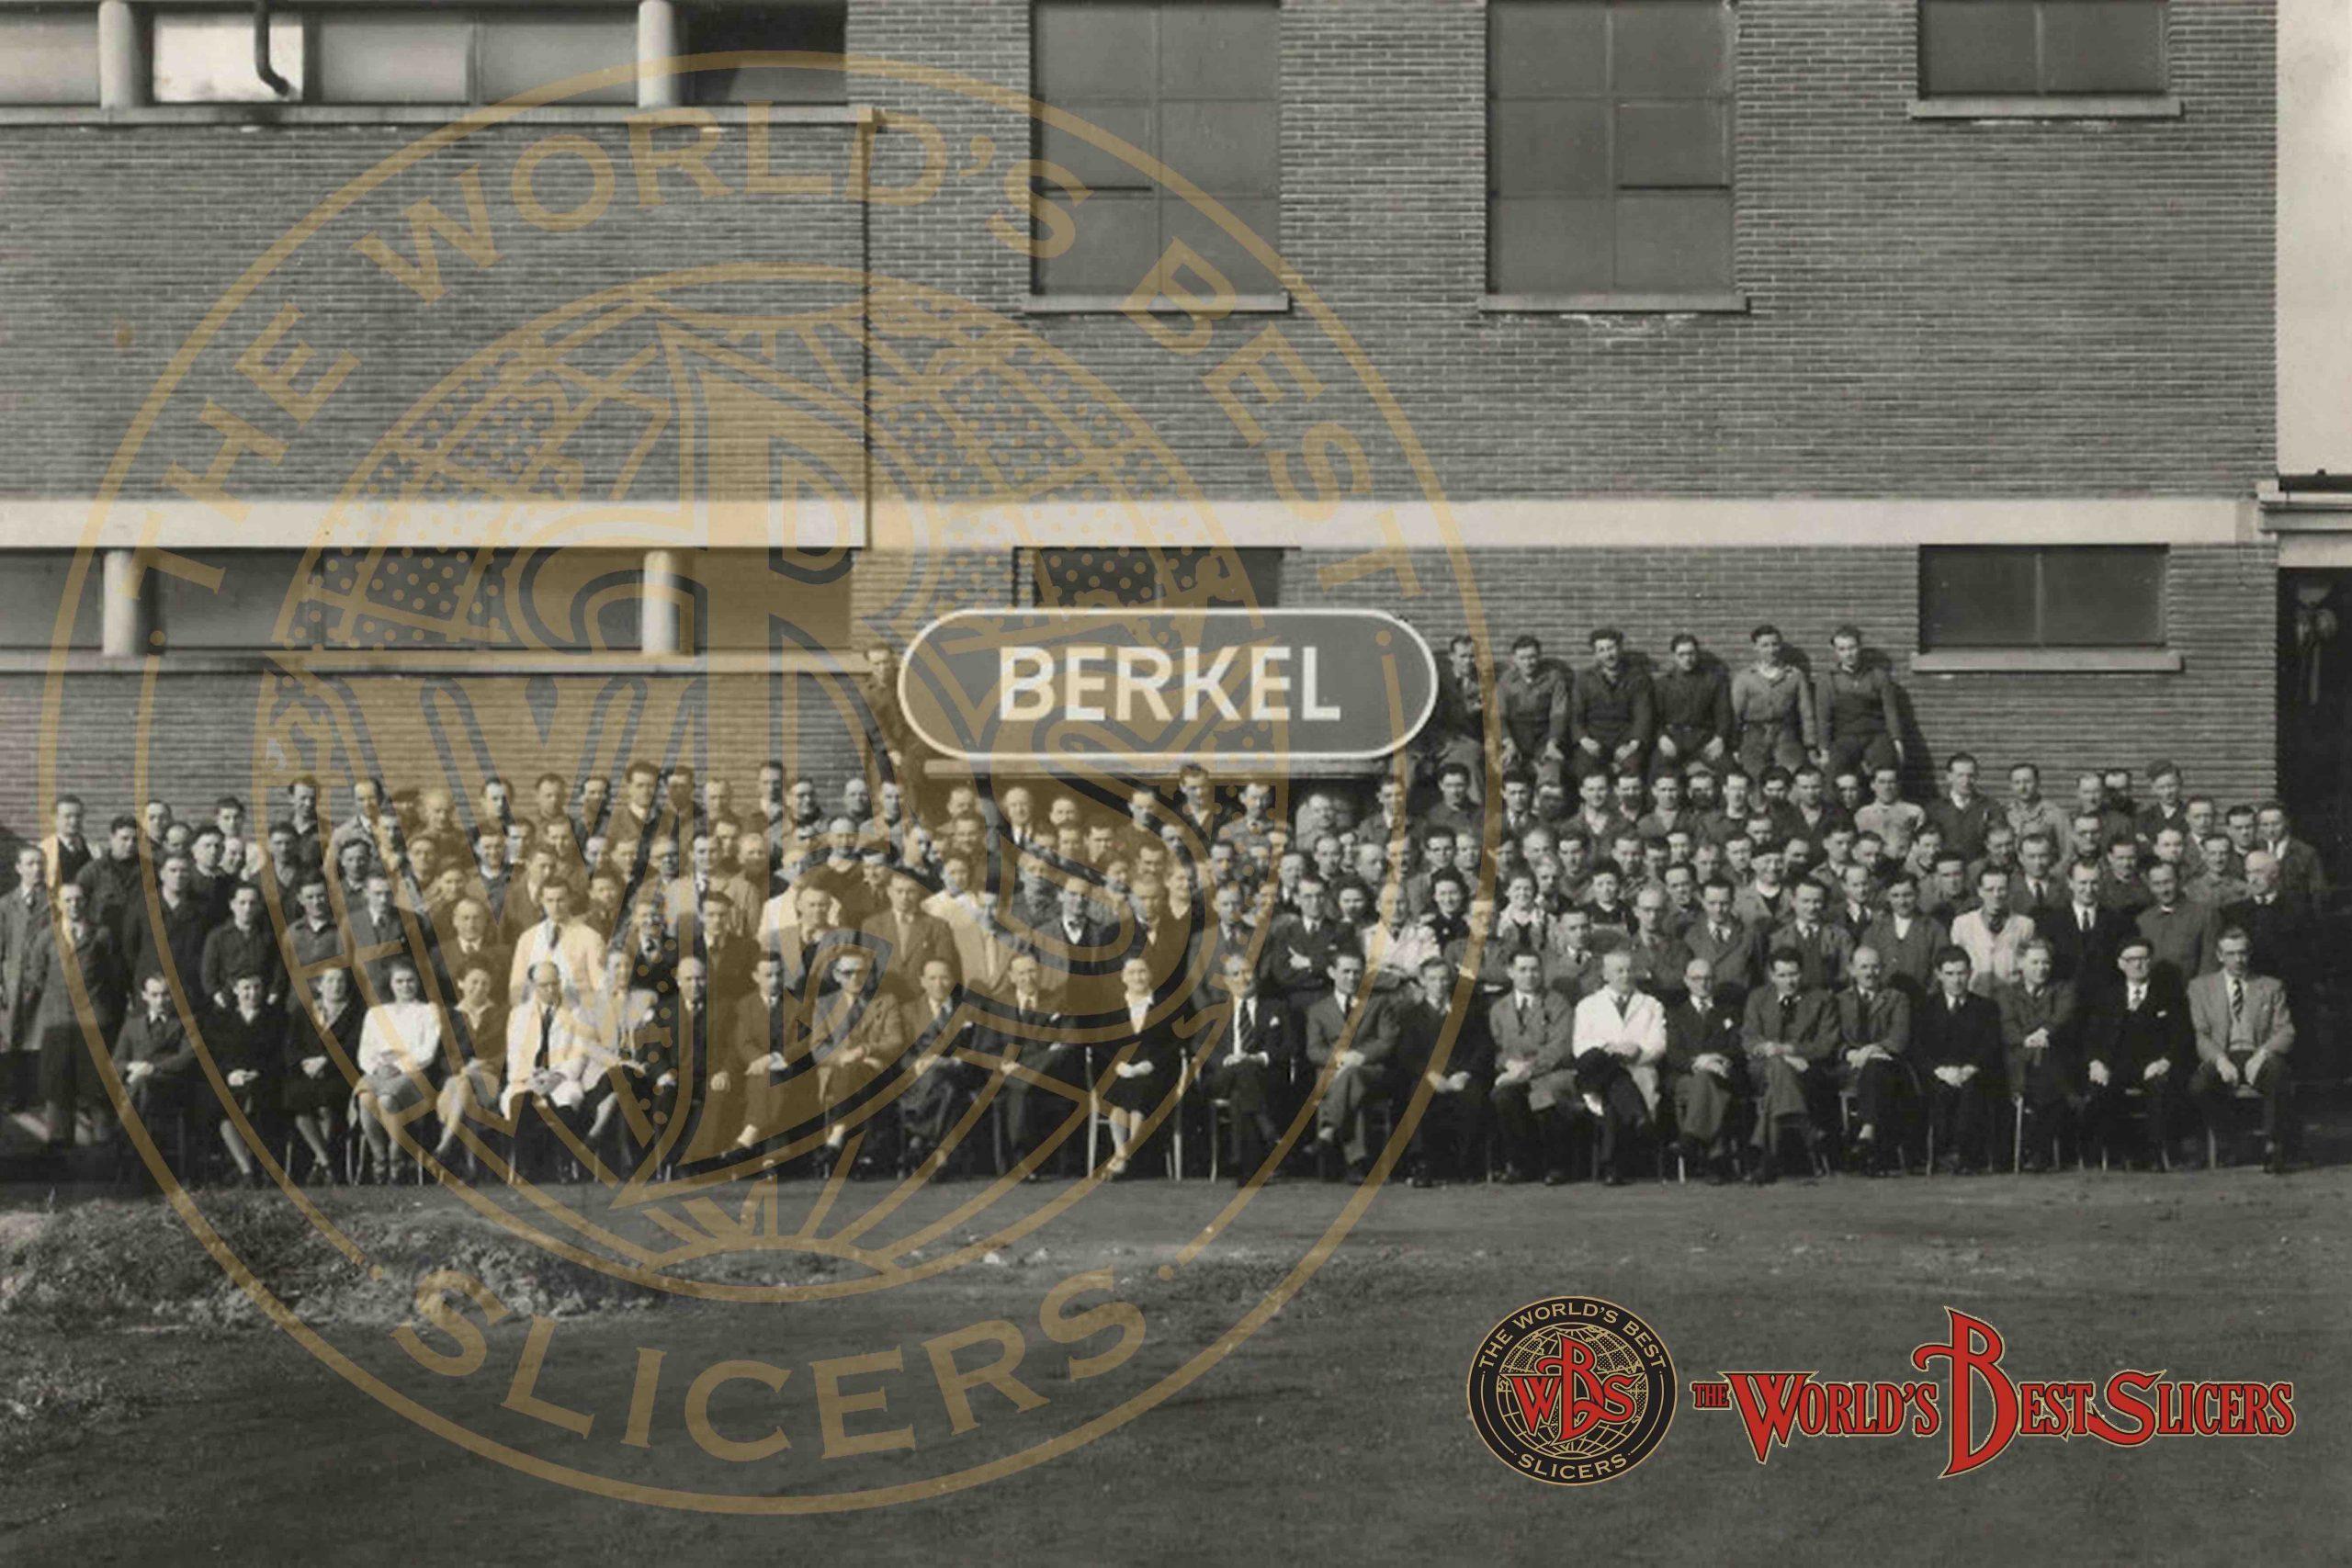 z-scaled W.A.Van Berkel's Geschichte